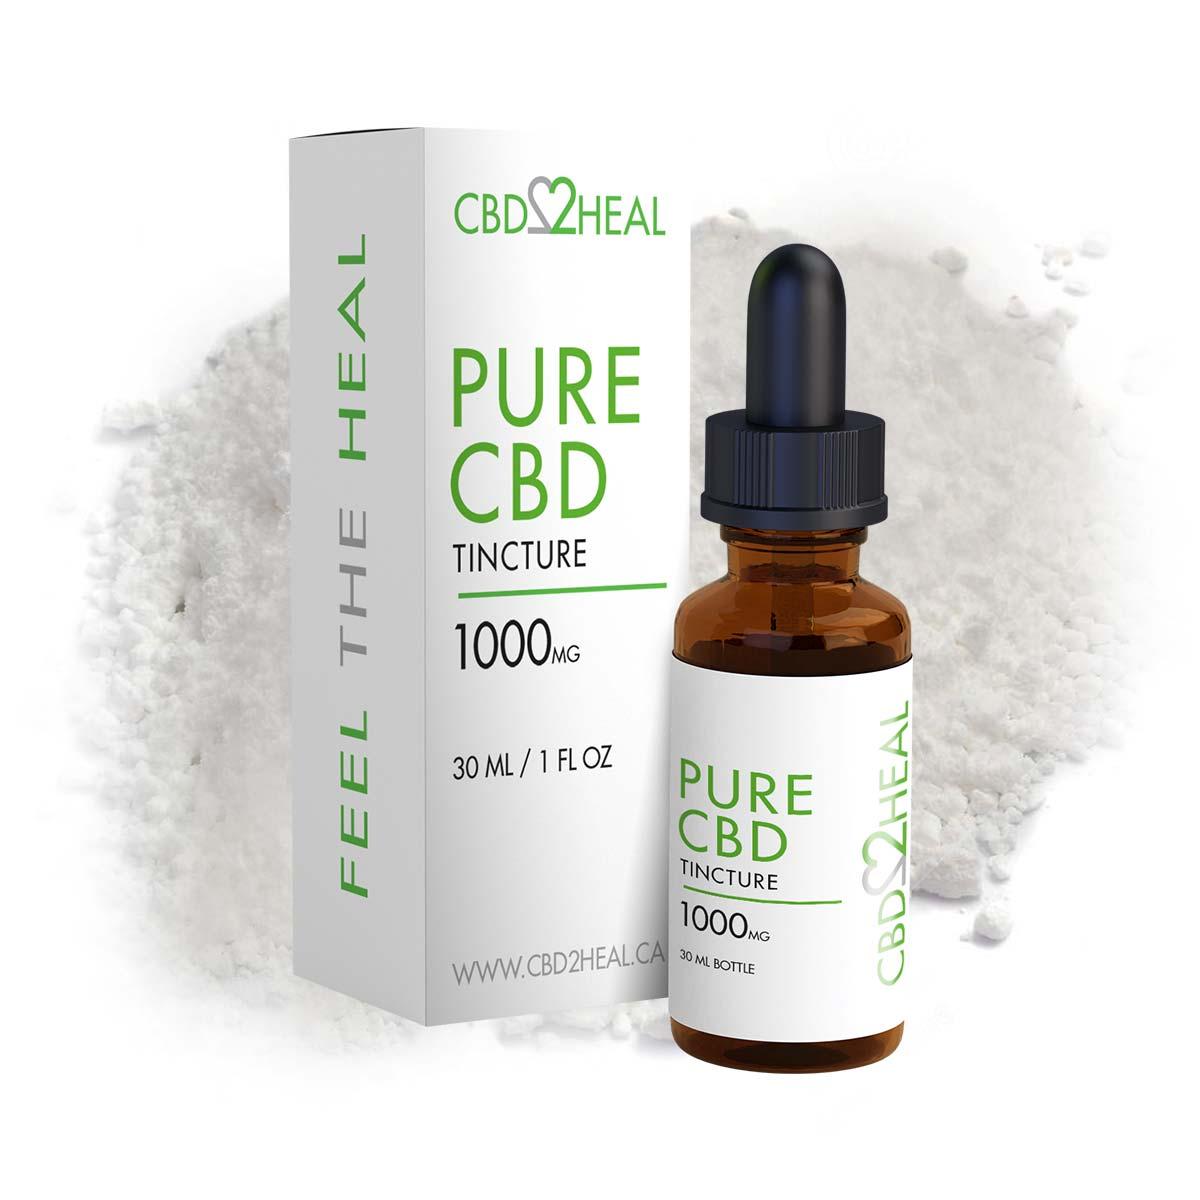 cbd2heal pure cbd oil tincture